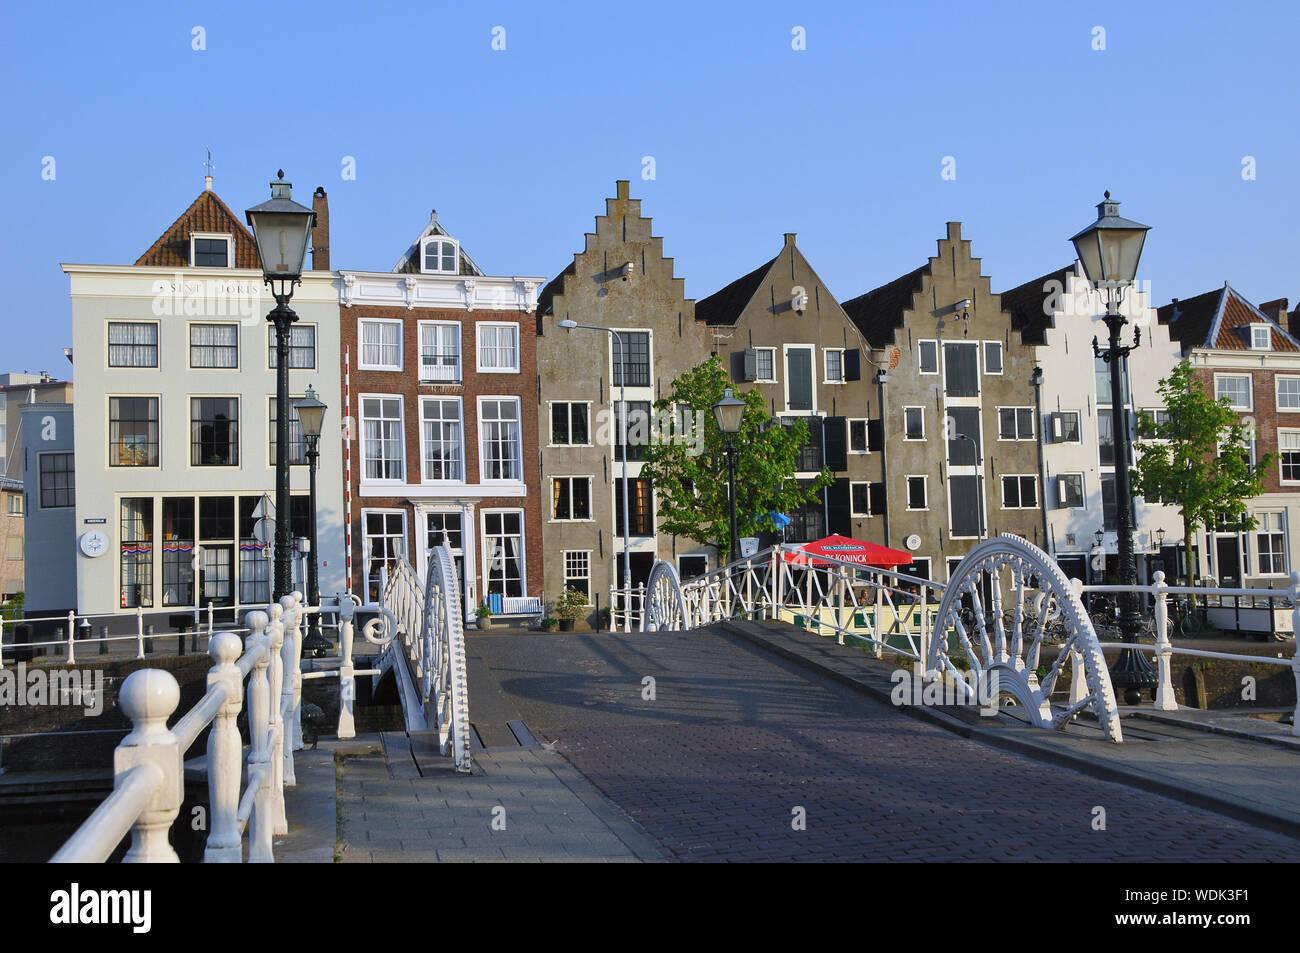 Middelburg, Zeeland, Netherlands, Europe Stock Photo